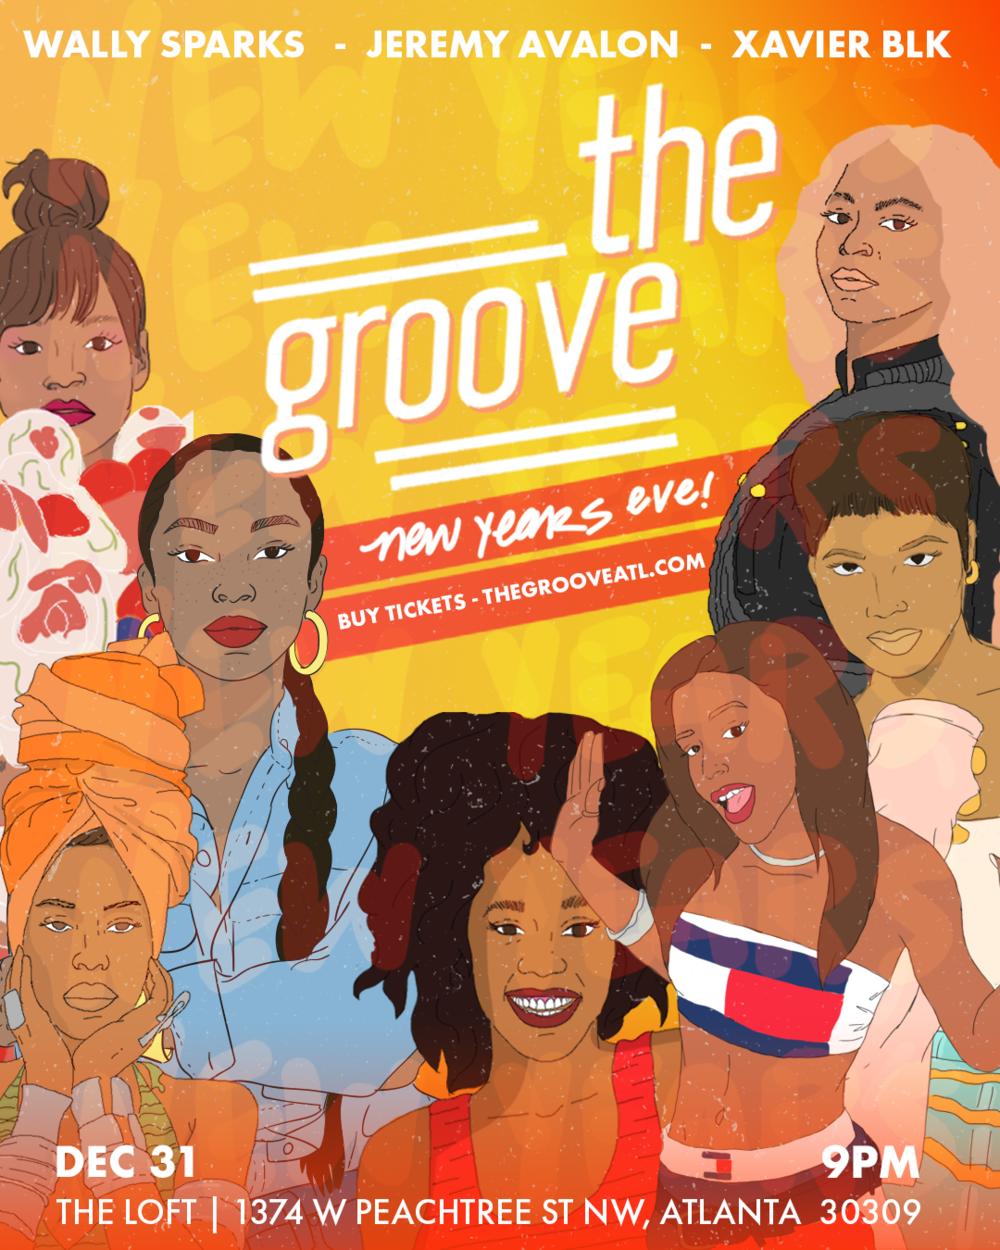 001-the-groove-nye-main.png